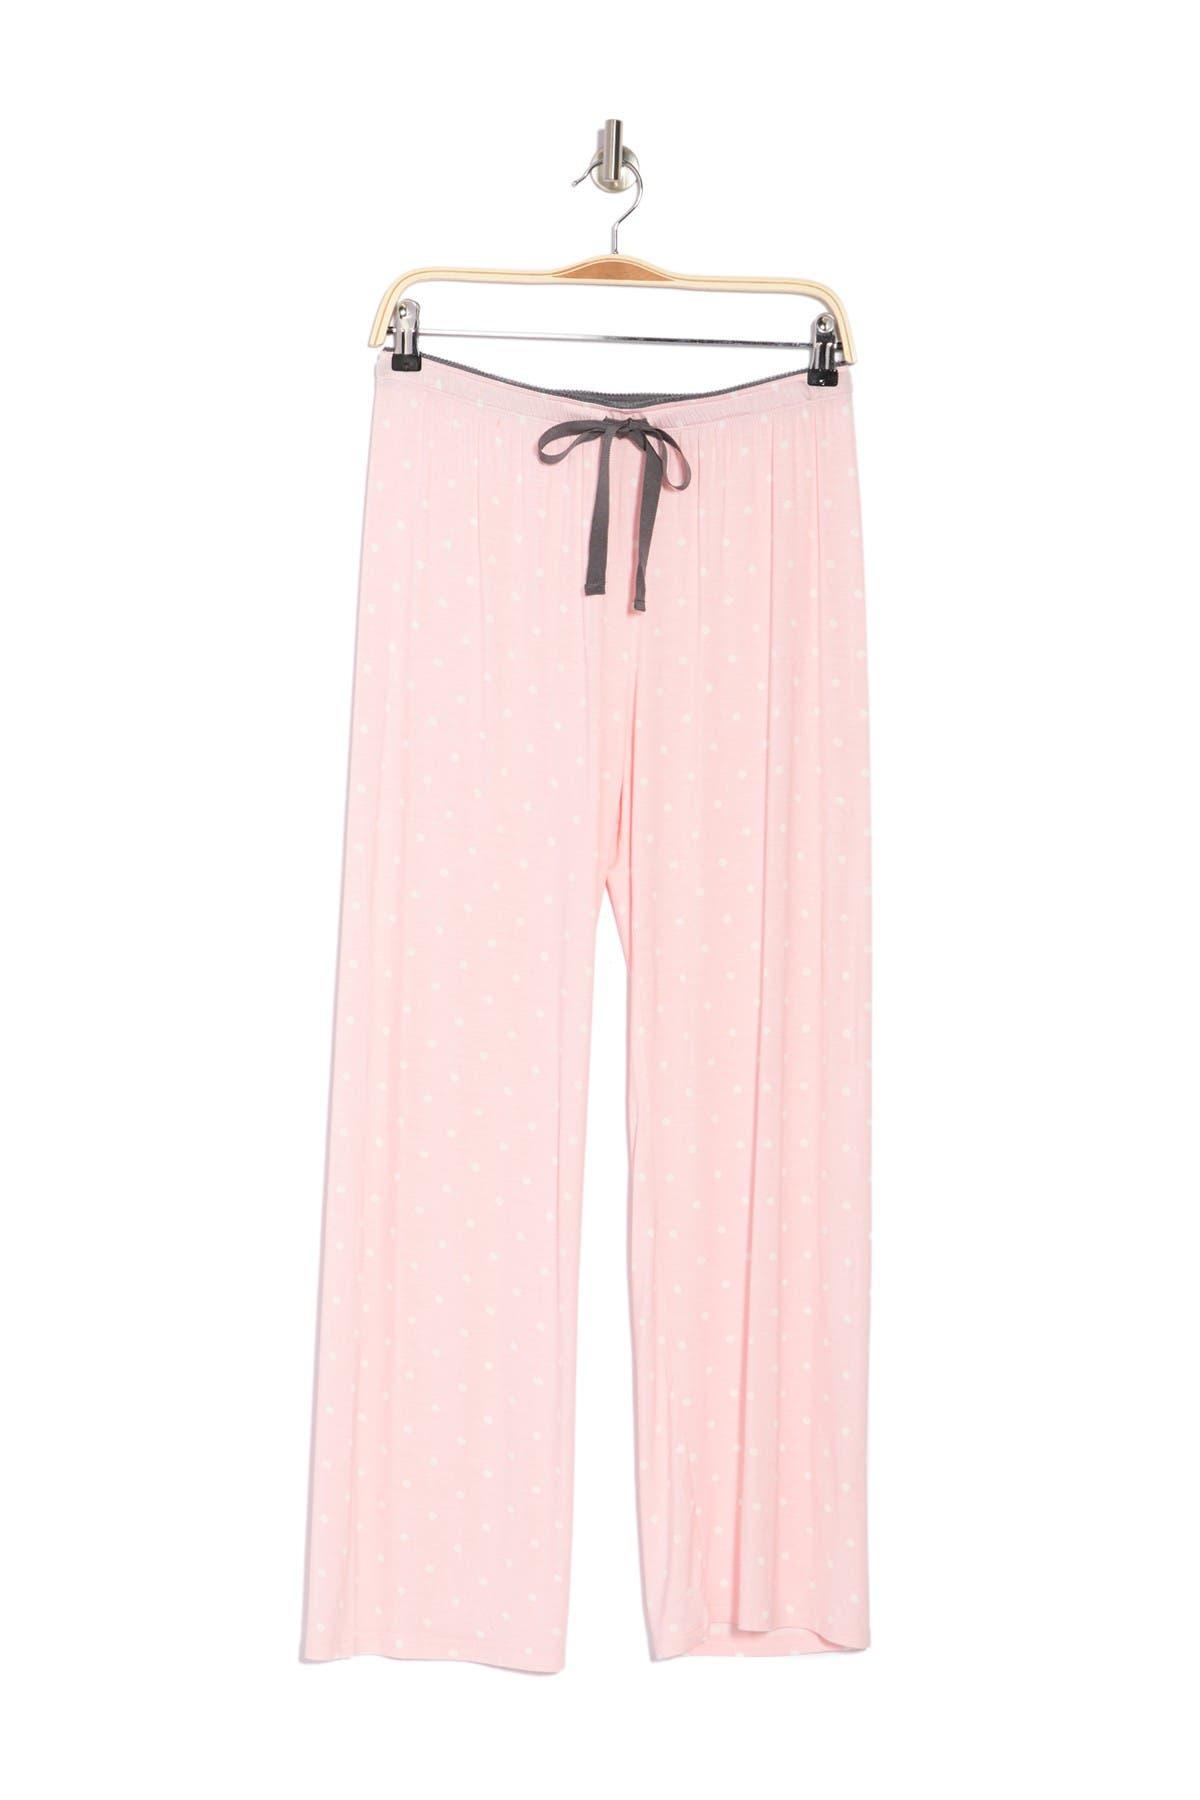 Image of PJ SALVAGE Printed Lounge Pants